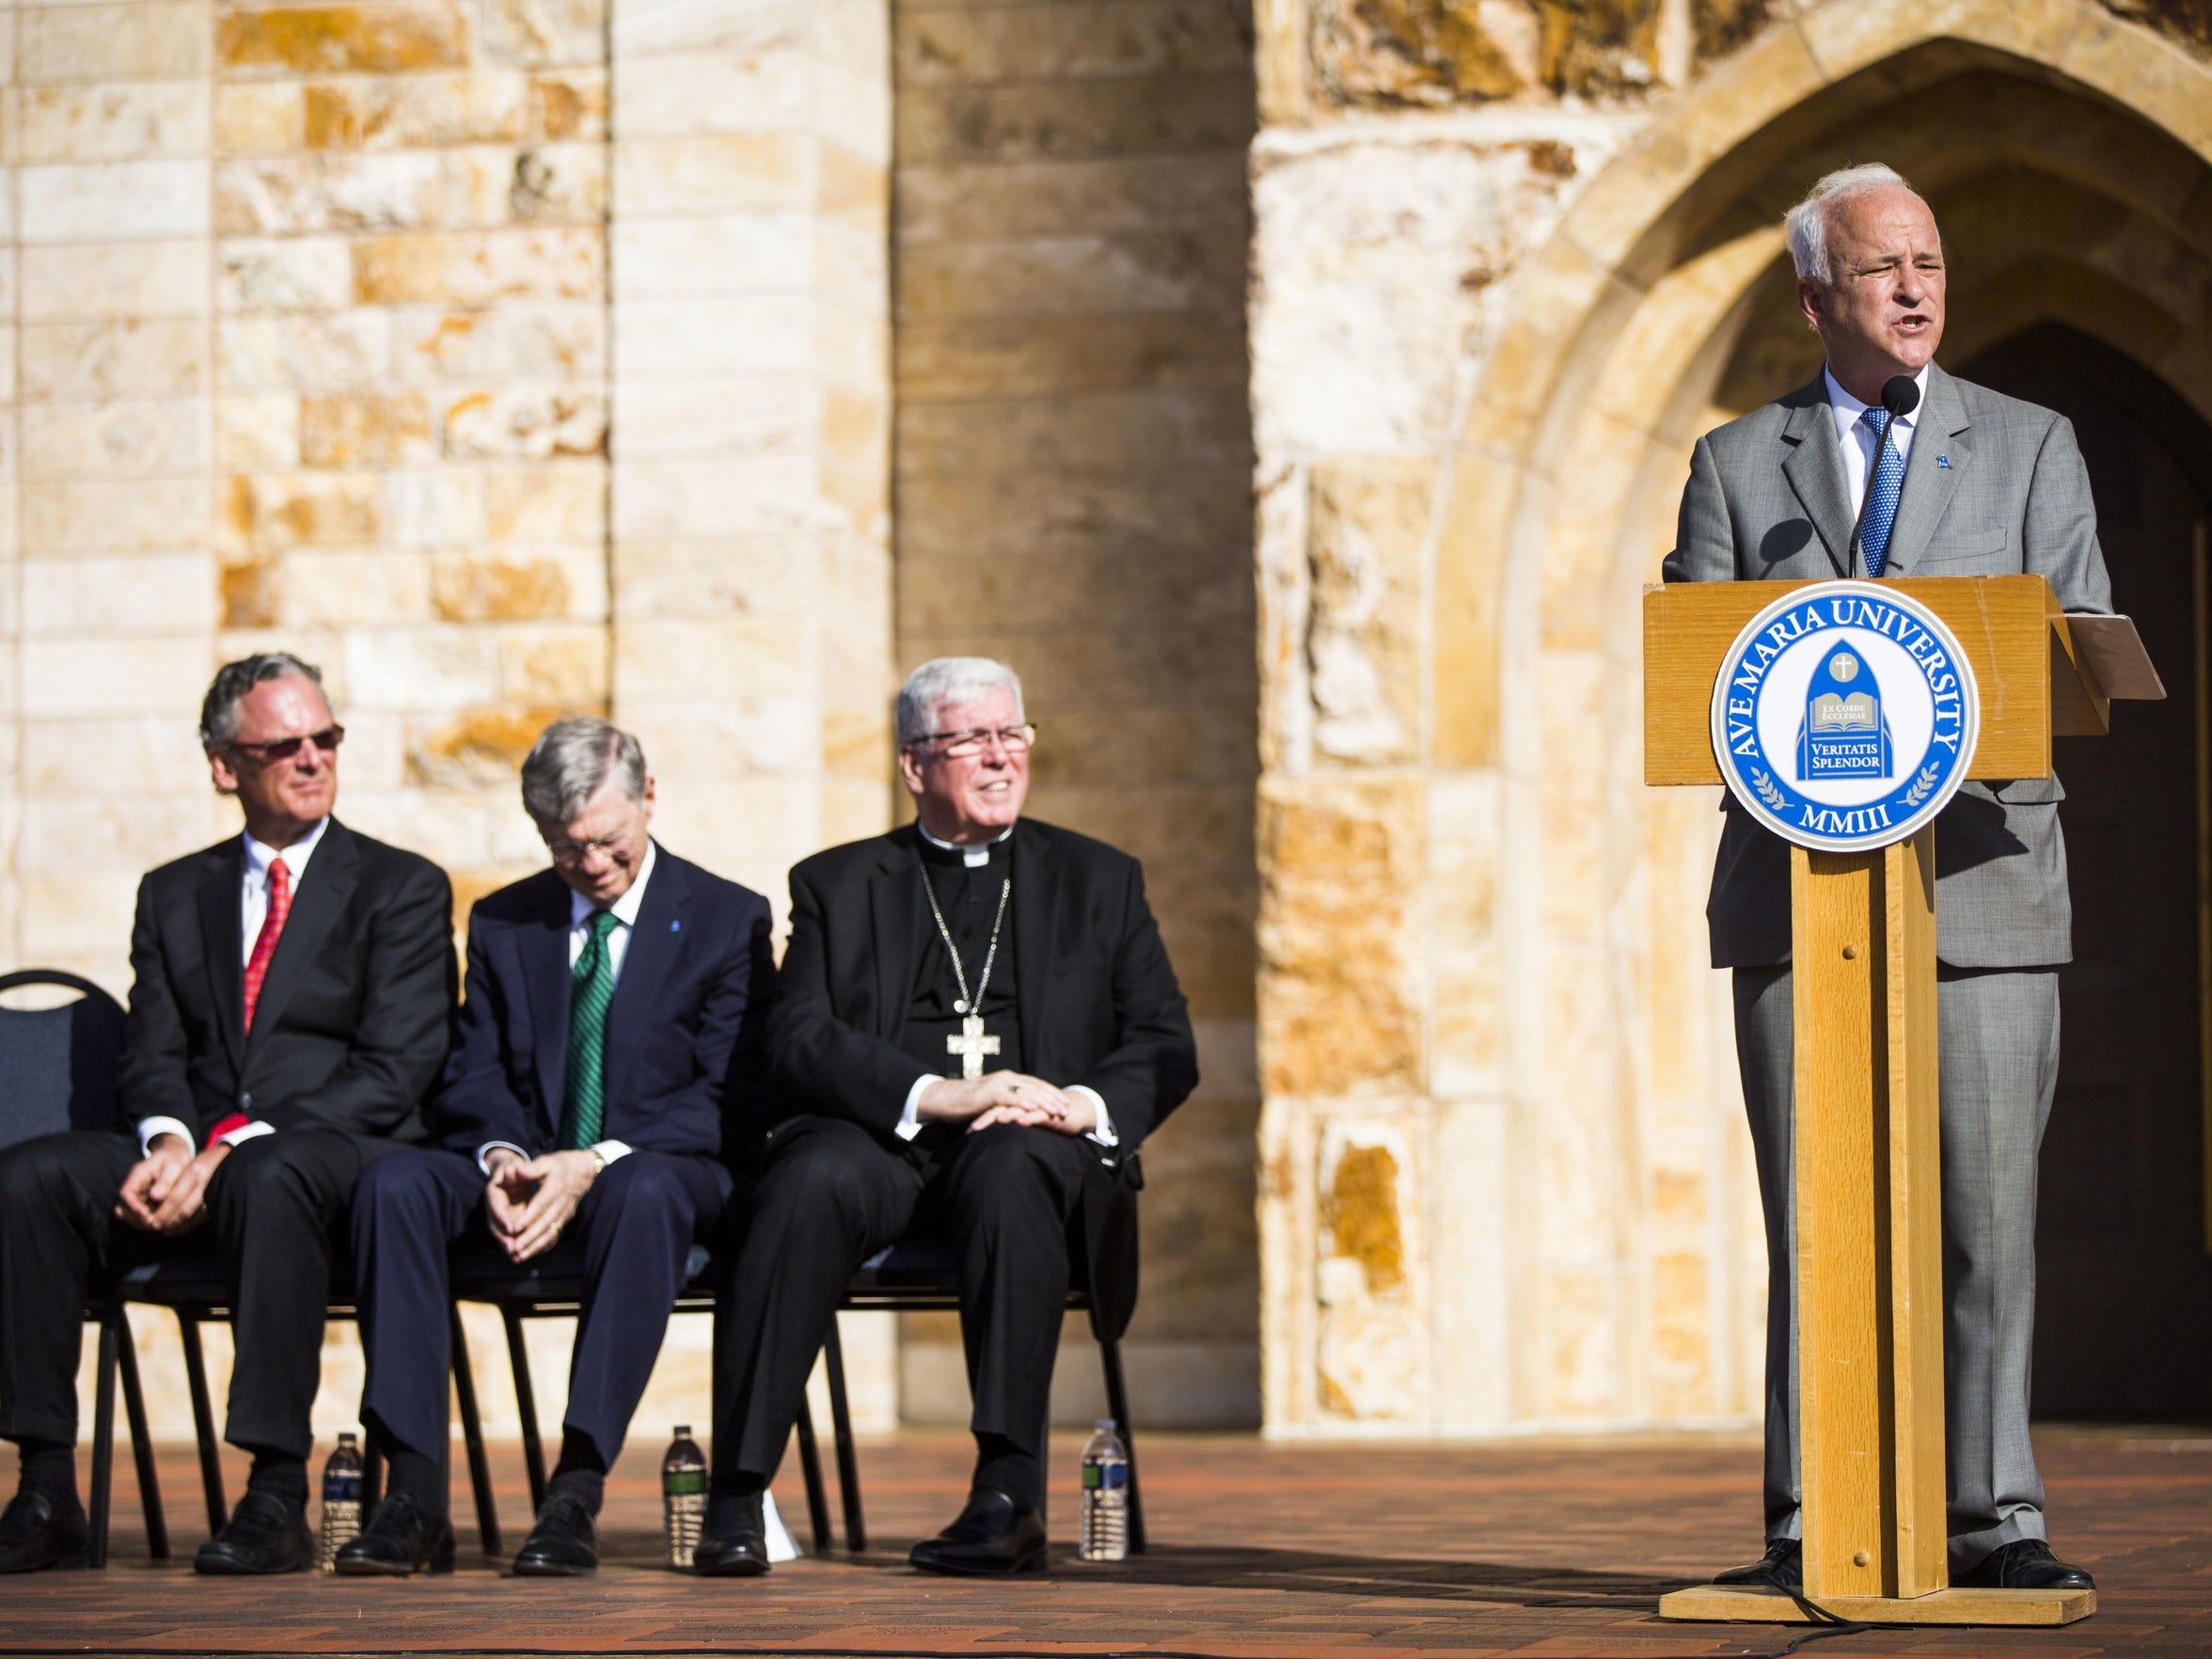 Ave Maria University President Jim Towey speaks on